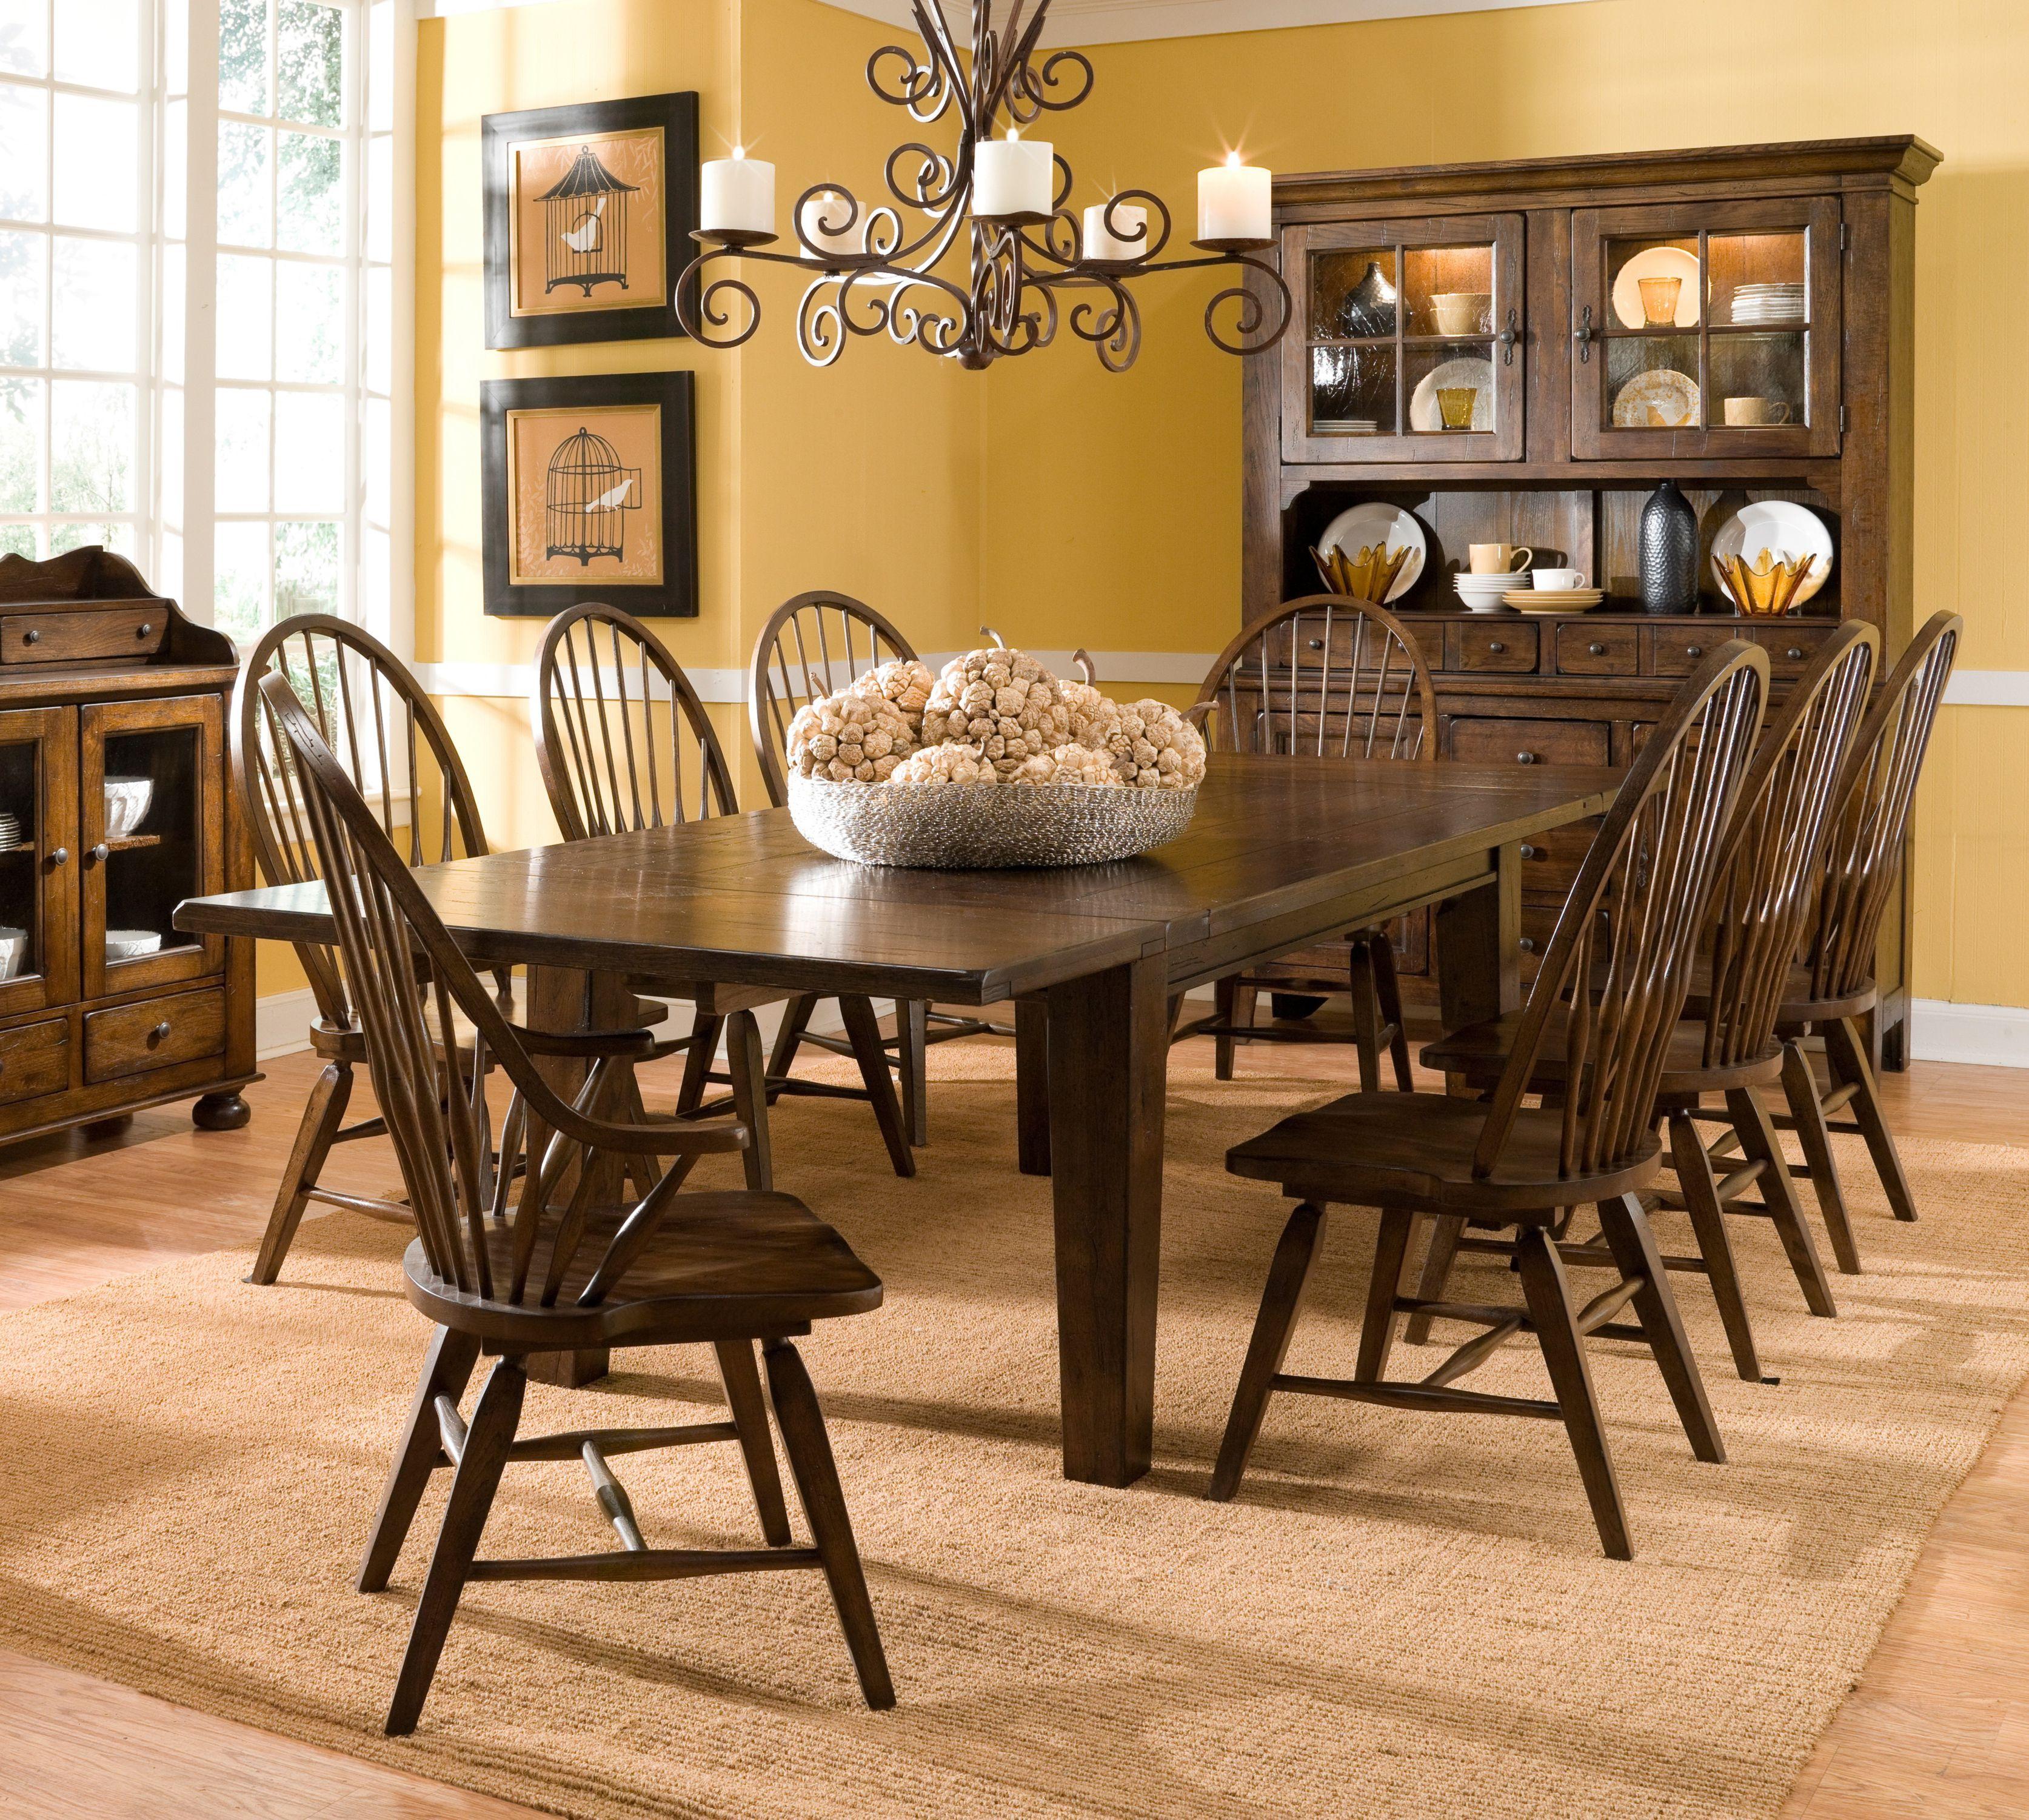 Broyhill Attic Heirlooms Rustic Oak Rectangular Leg Dining Table